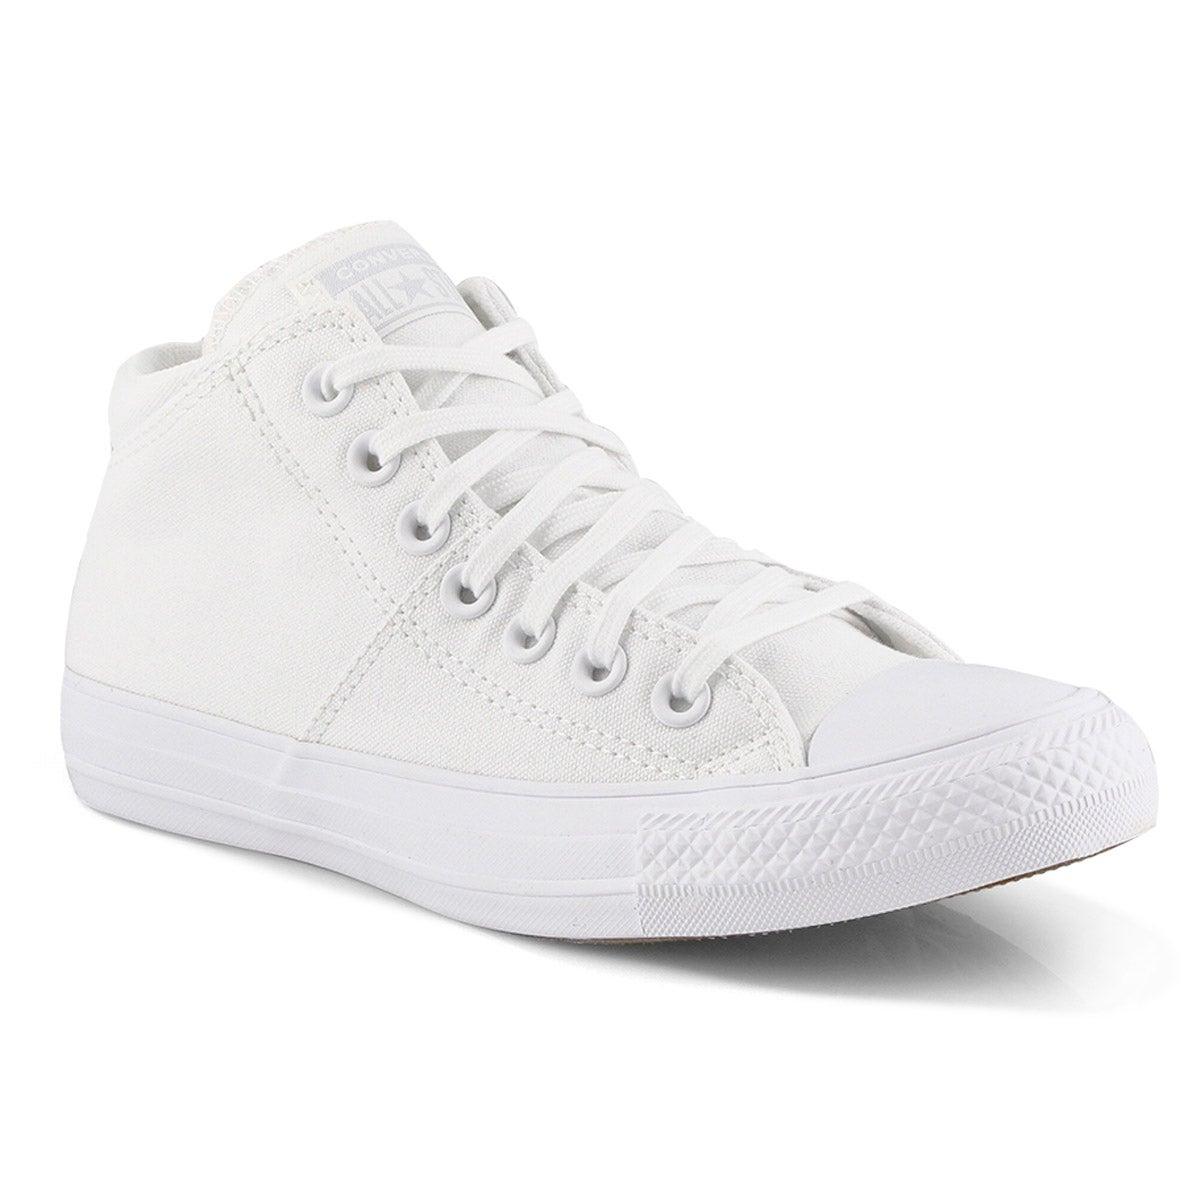 Lds CTAS Madison Mid mono wht sneaker